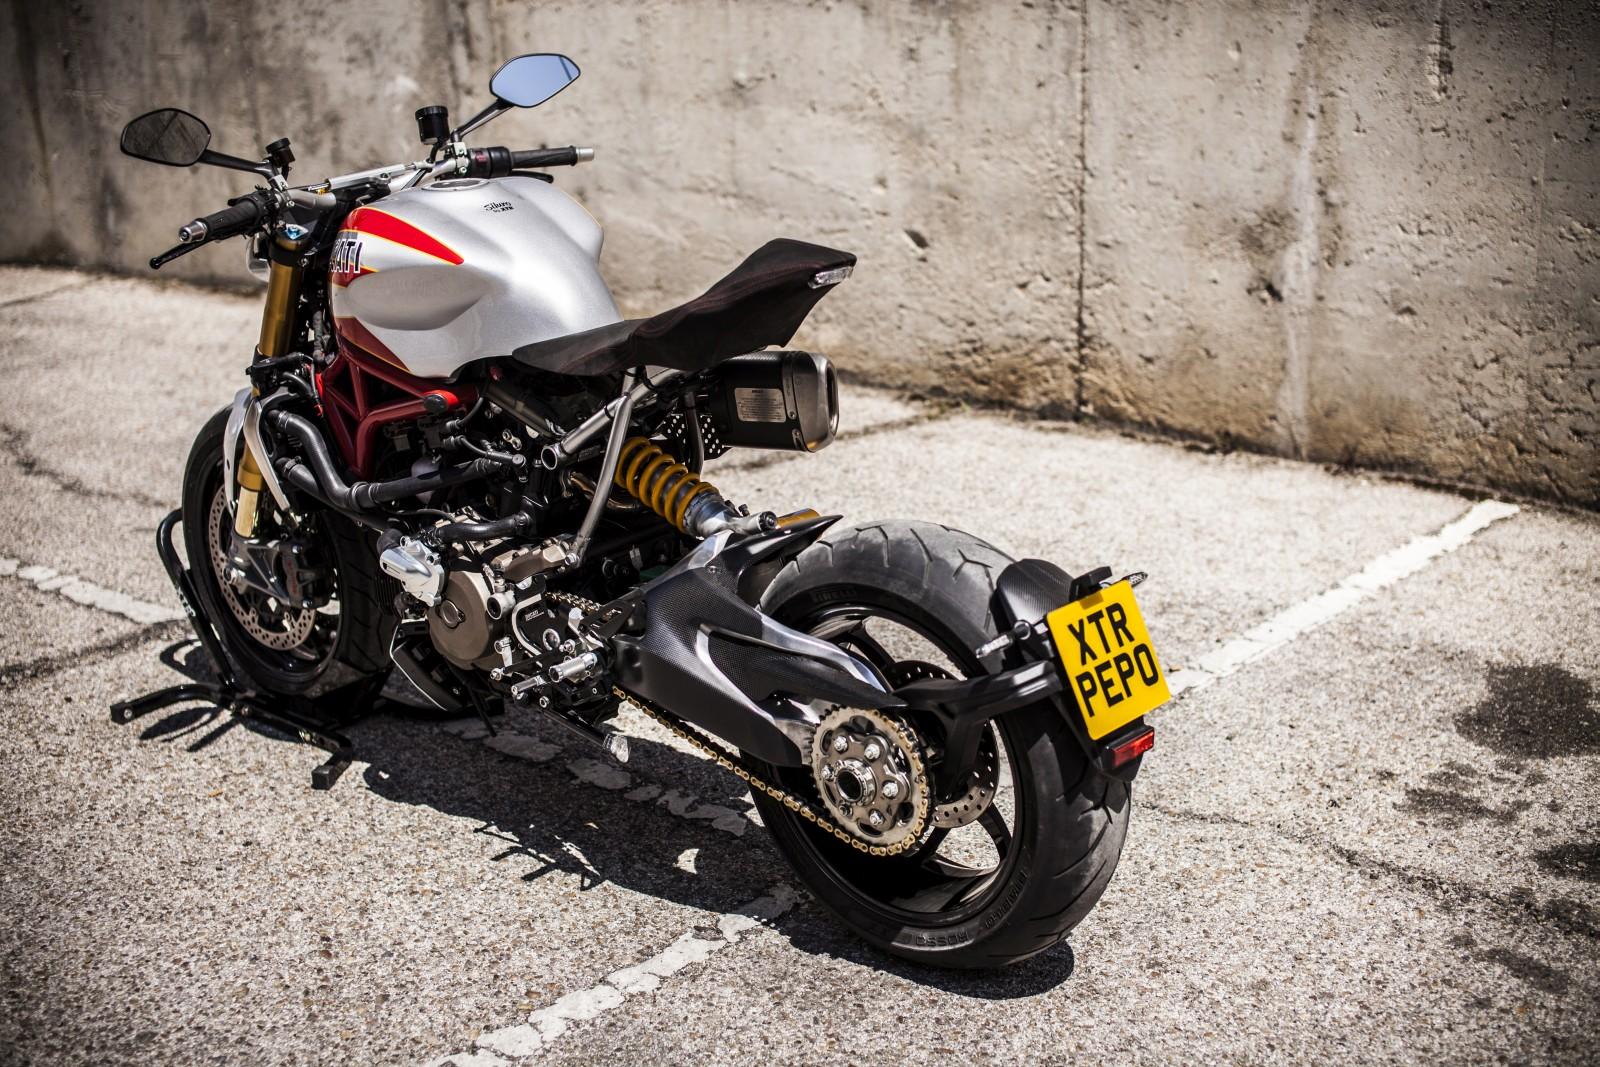 Customised Ducati Monster 1200 - XTR Pepo Siluro (9)